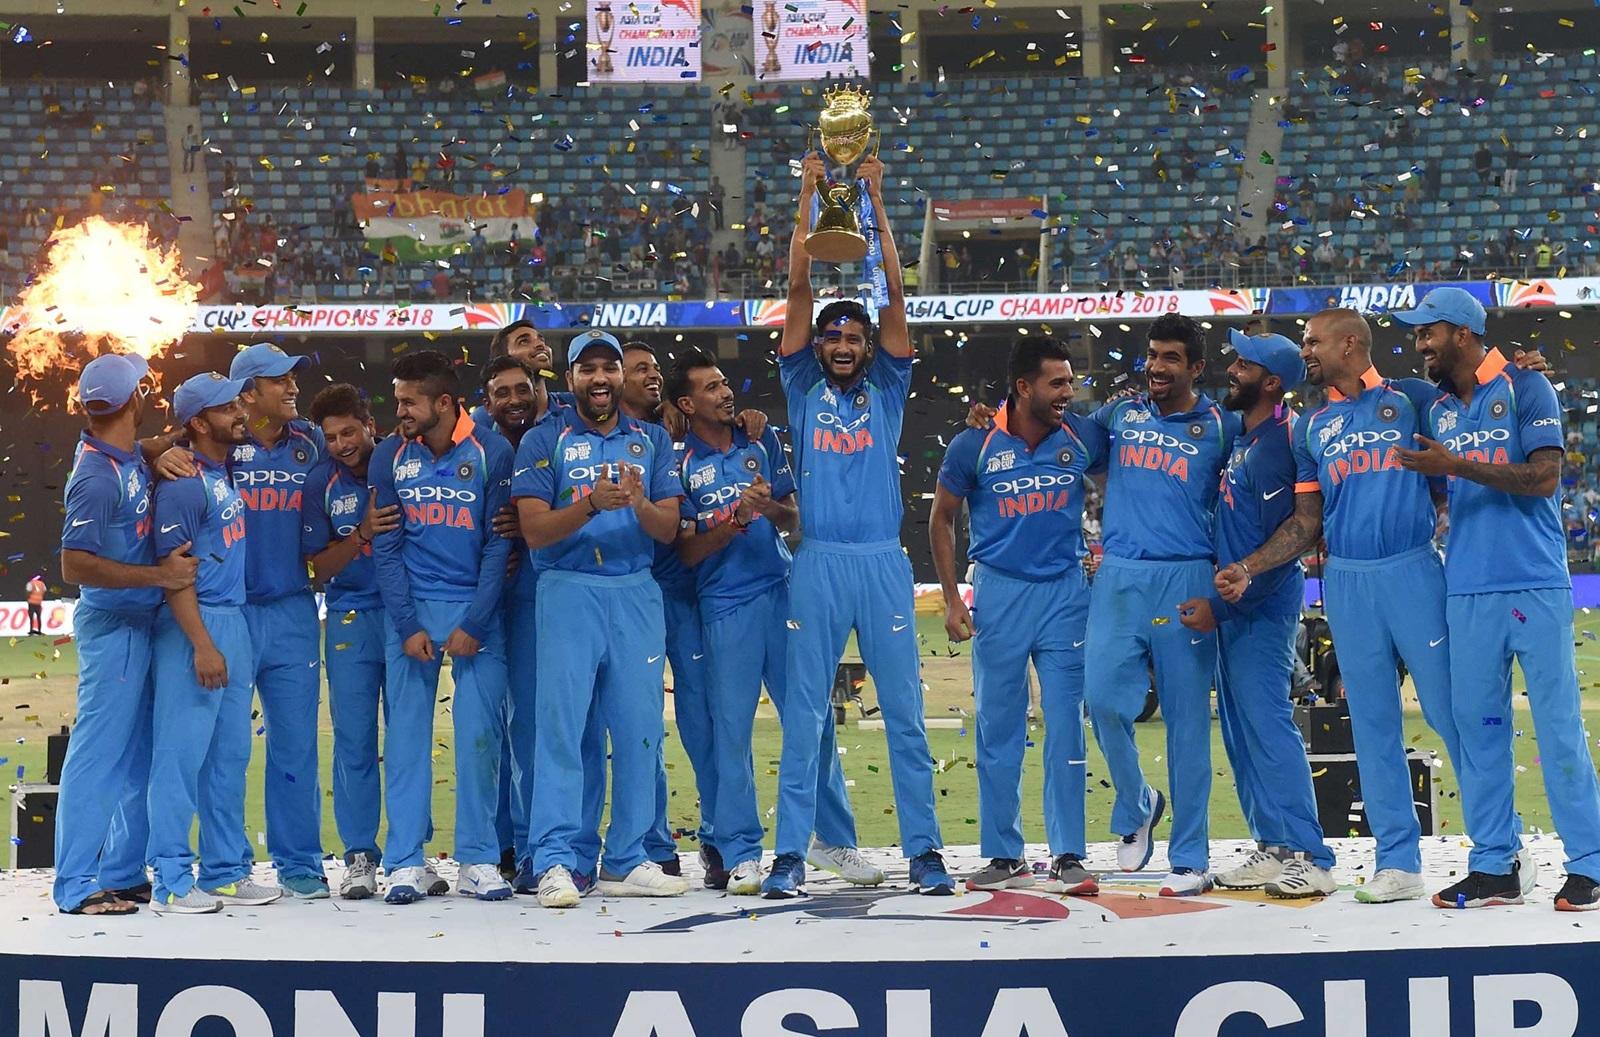 India claim Asia Cup in last-ball thriller | cricket.com.au